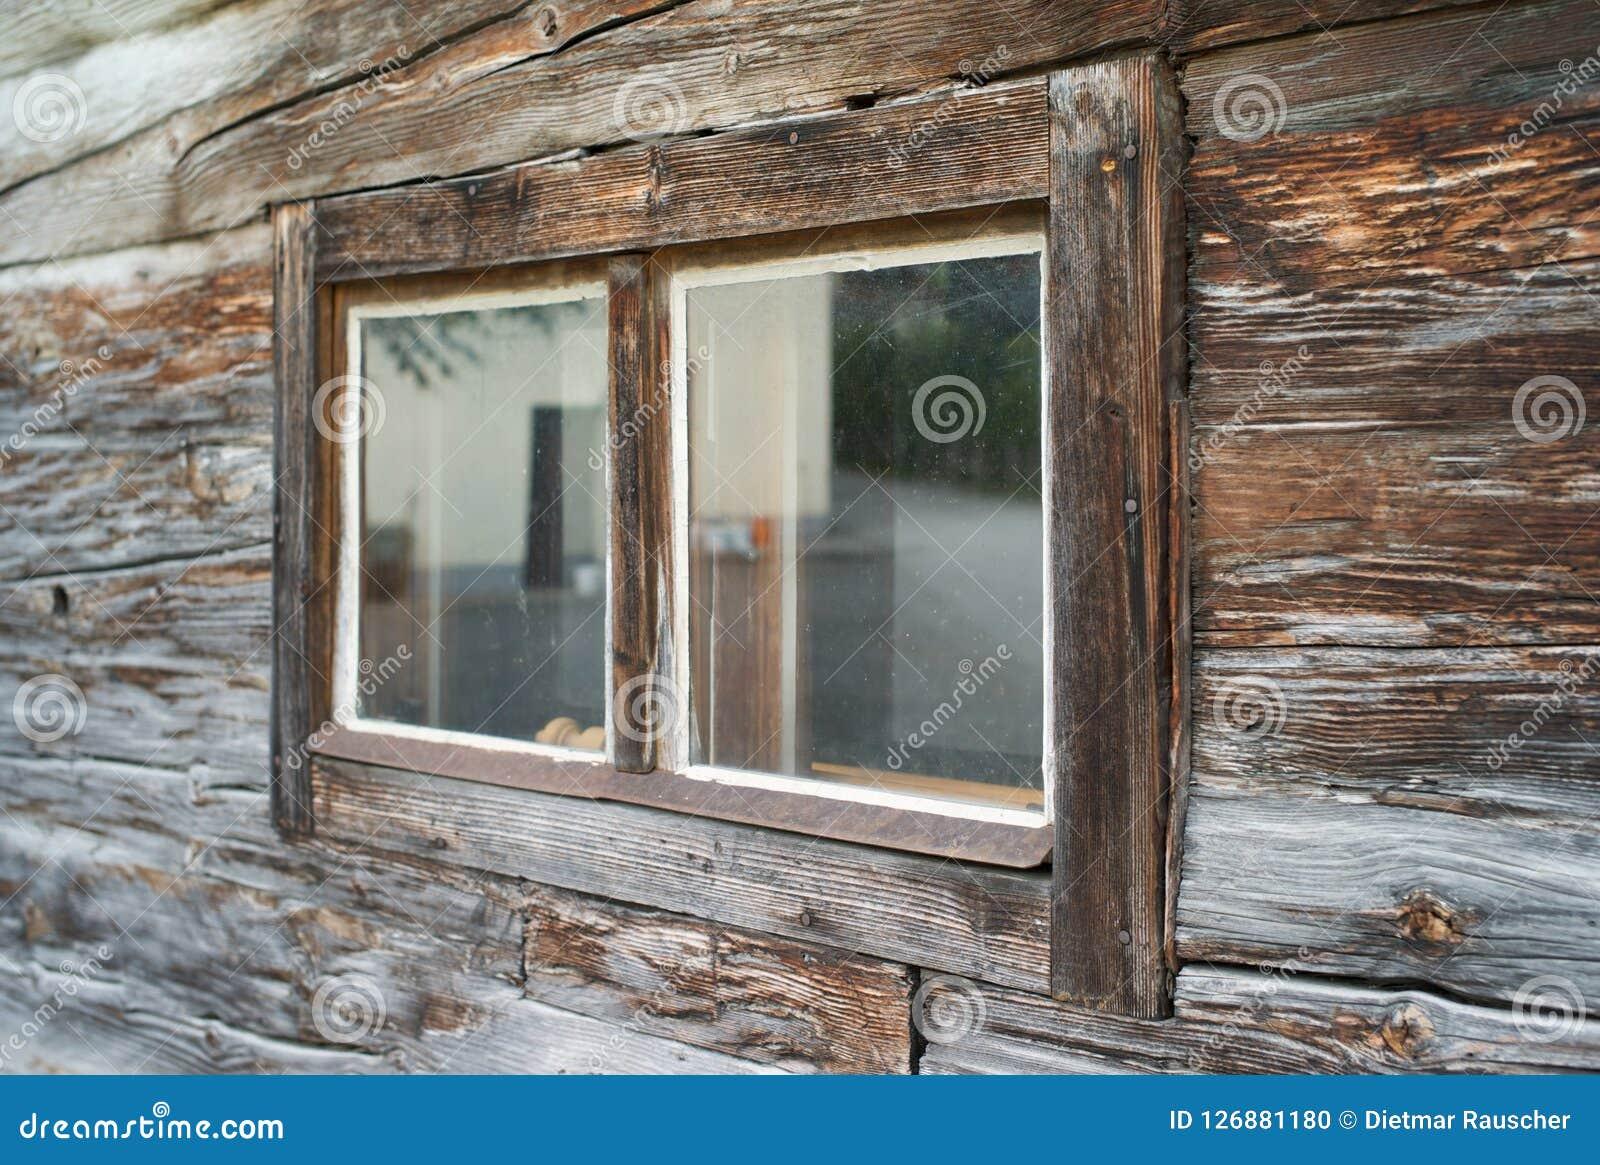 Verwittertes altes Fenster eines Holzhauses